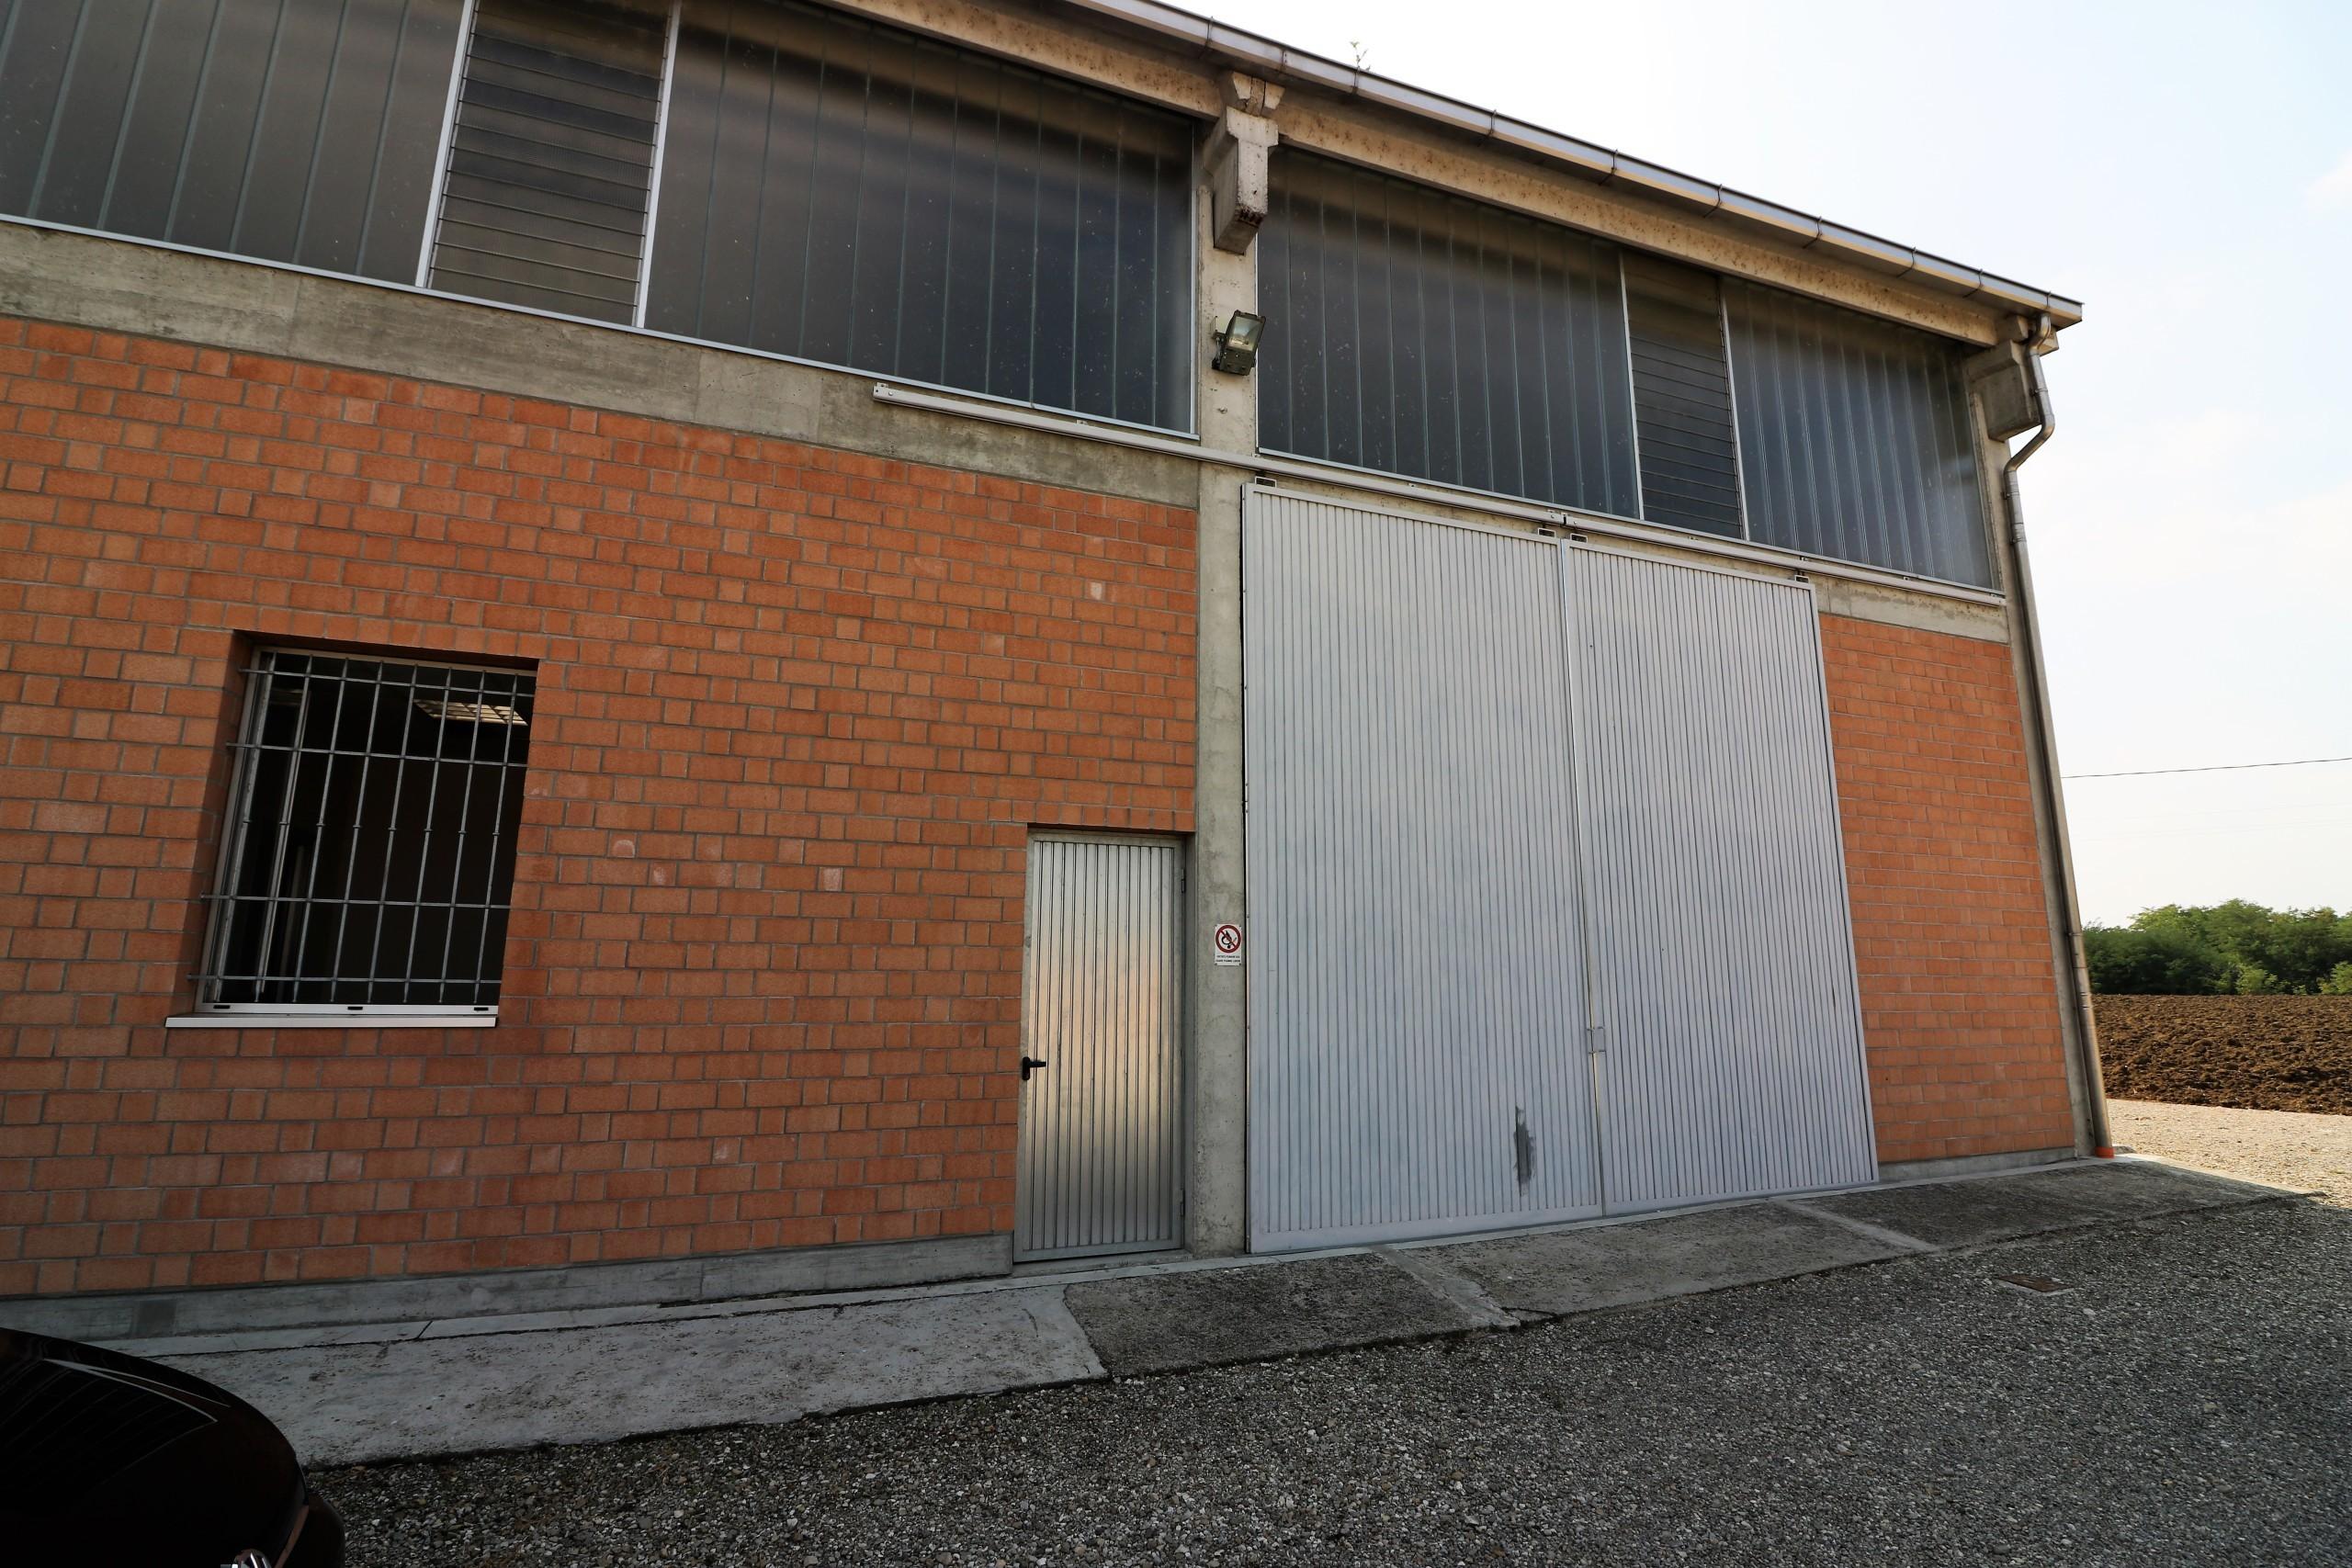 Capannone / Fondo Magazzino